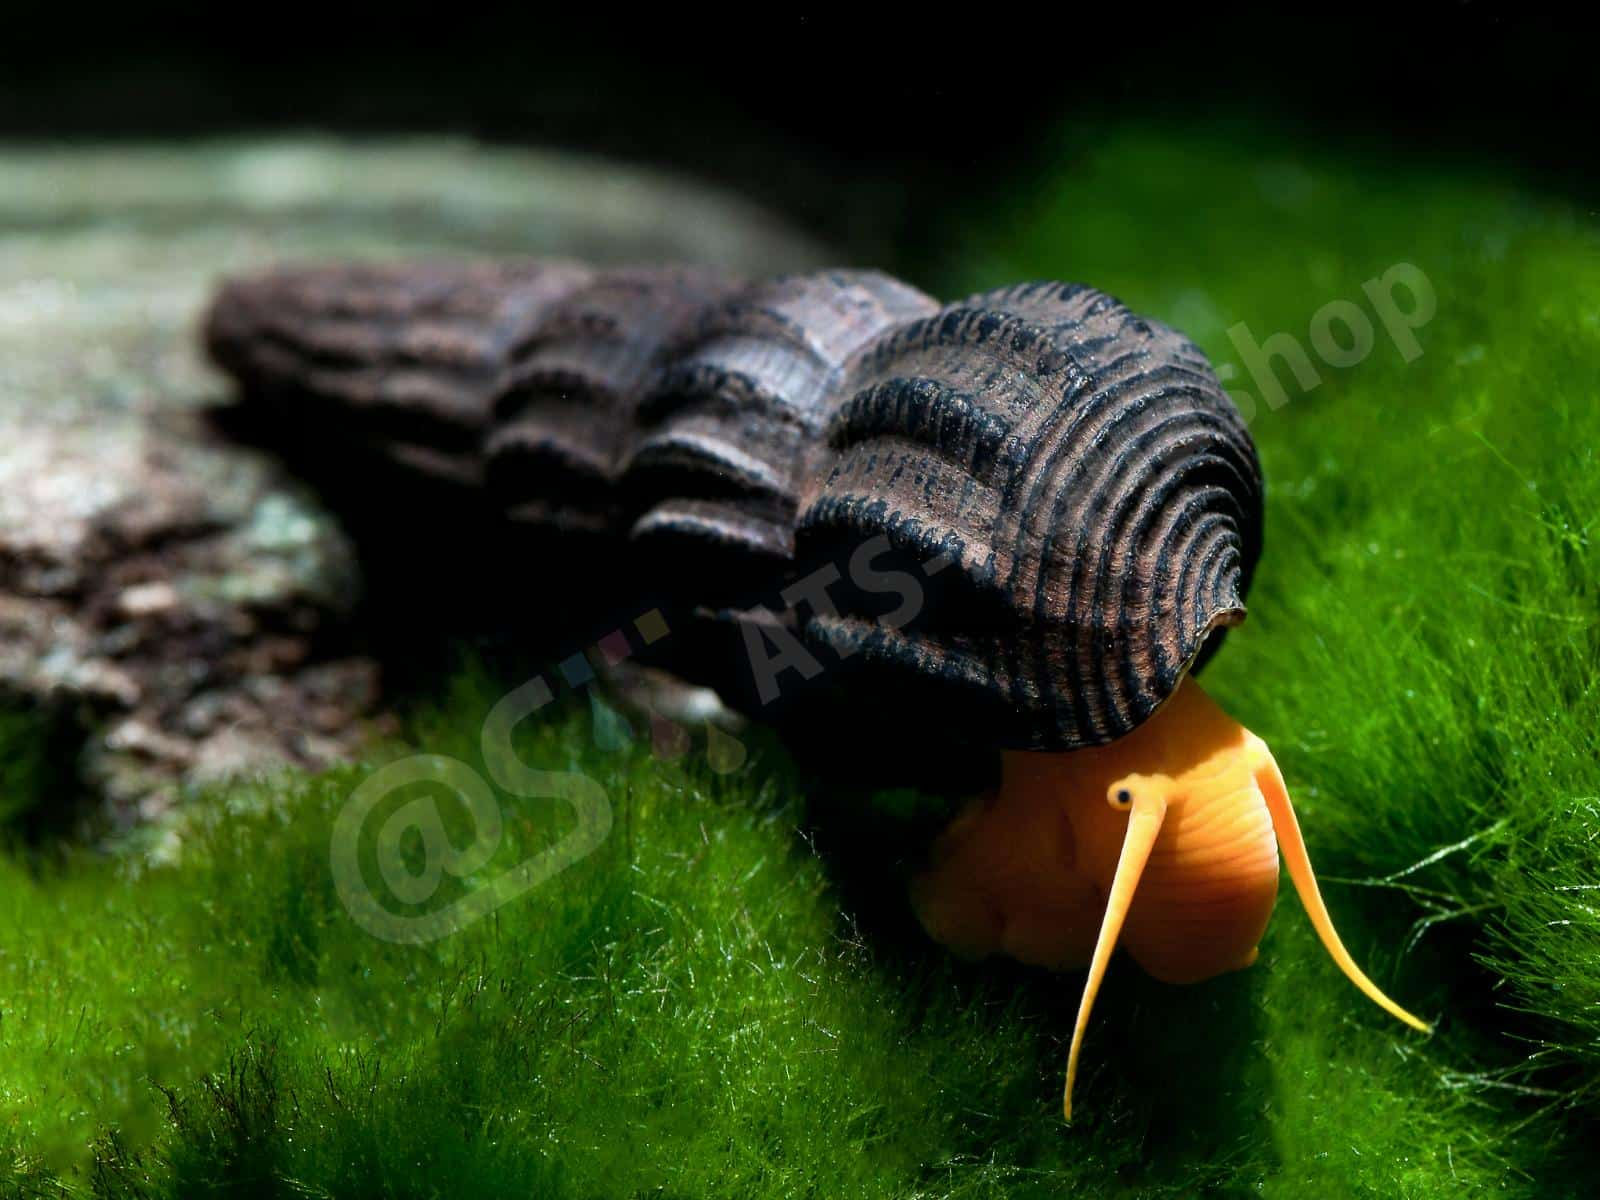 tylomelania sp yellow enrico richter 0090 7